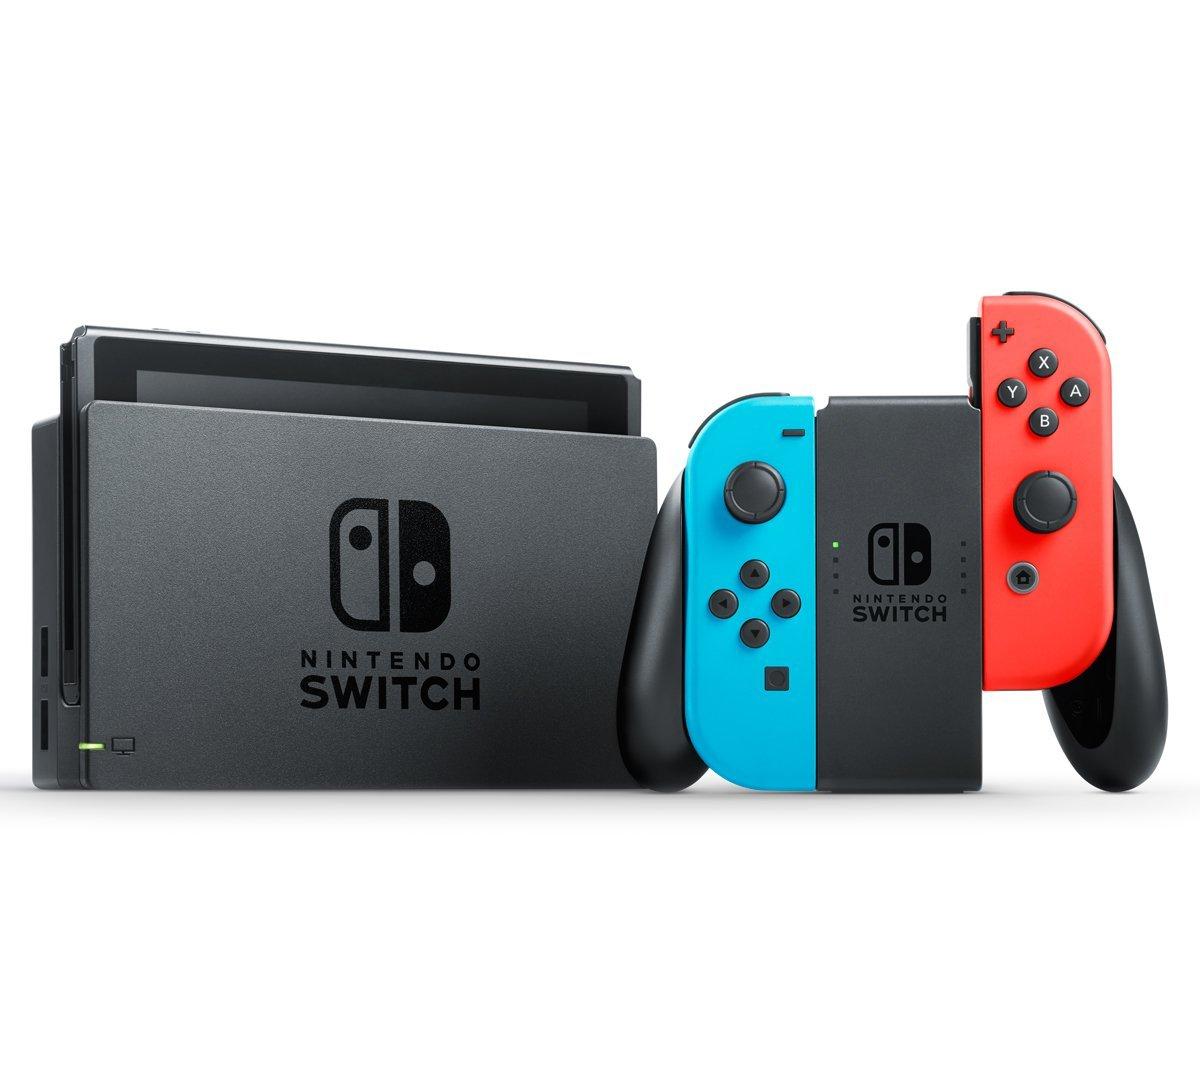 Nintendo Switch Joy-Con (L) ネオンブルー/ (R) ネオンレッド※保証印がありません【Nintendo Switch本体】【鈴鹿 専売品】【062-190312-01fs】